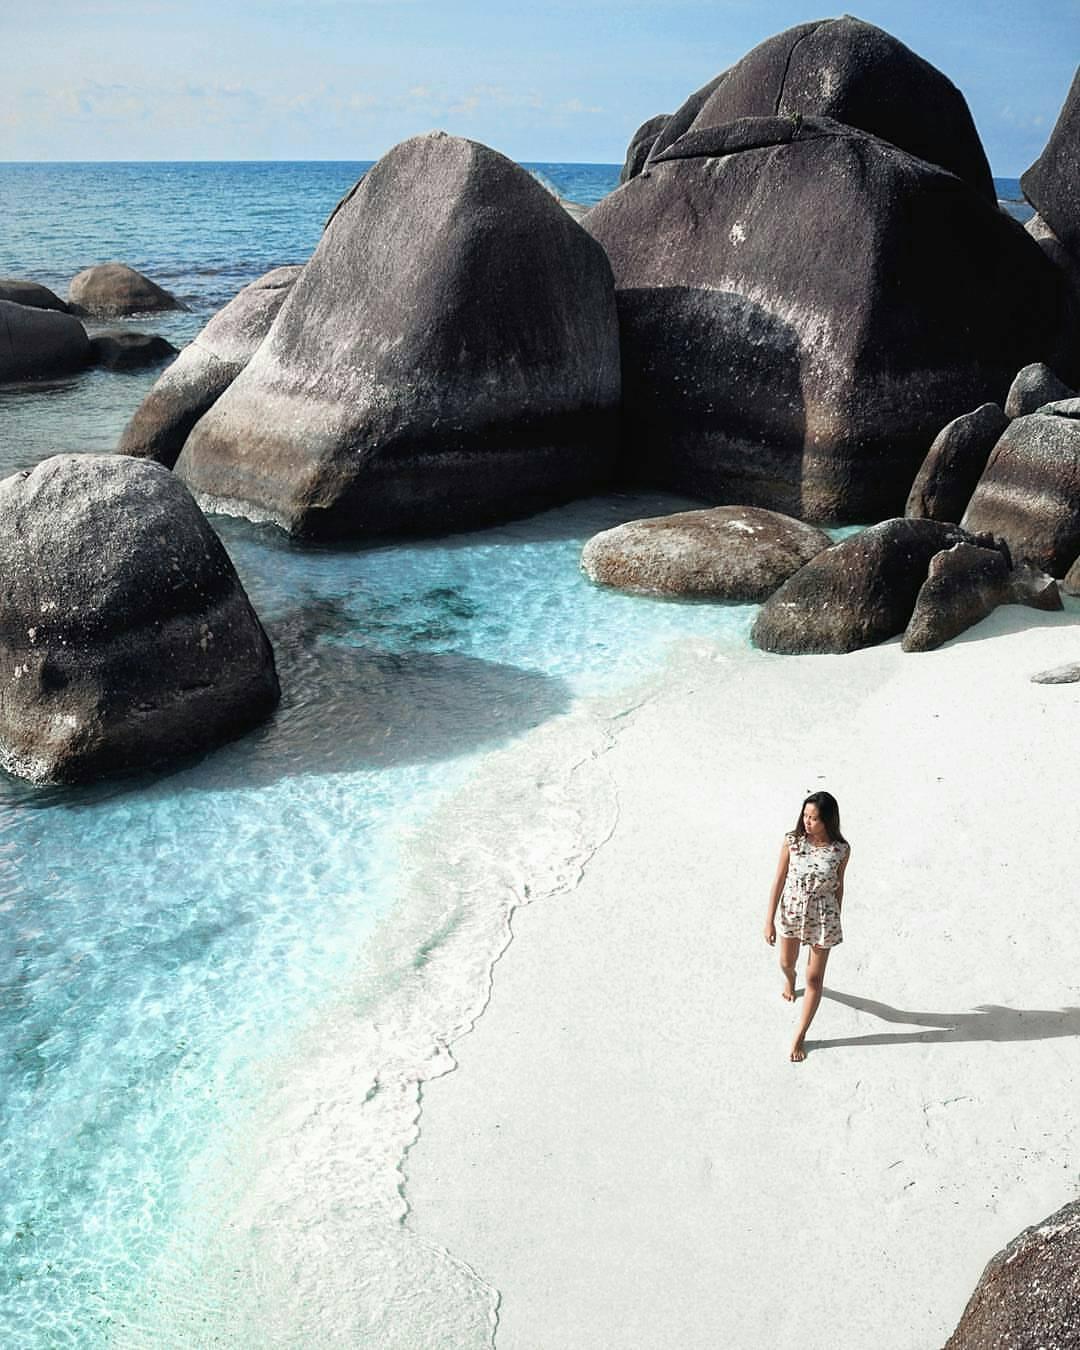 8 Wisata Paling Indah di Pulau Belitung, Negerinya Laskar Pelangi!